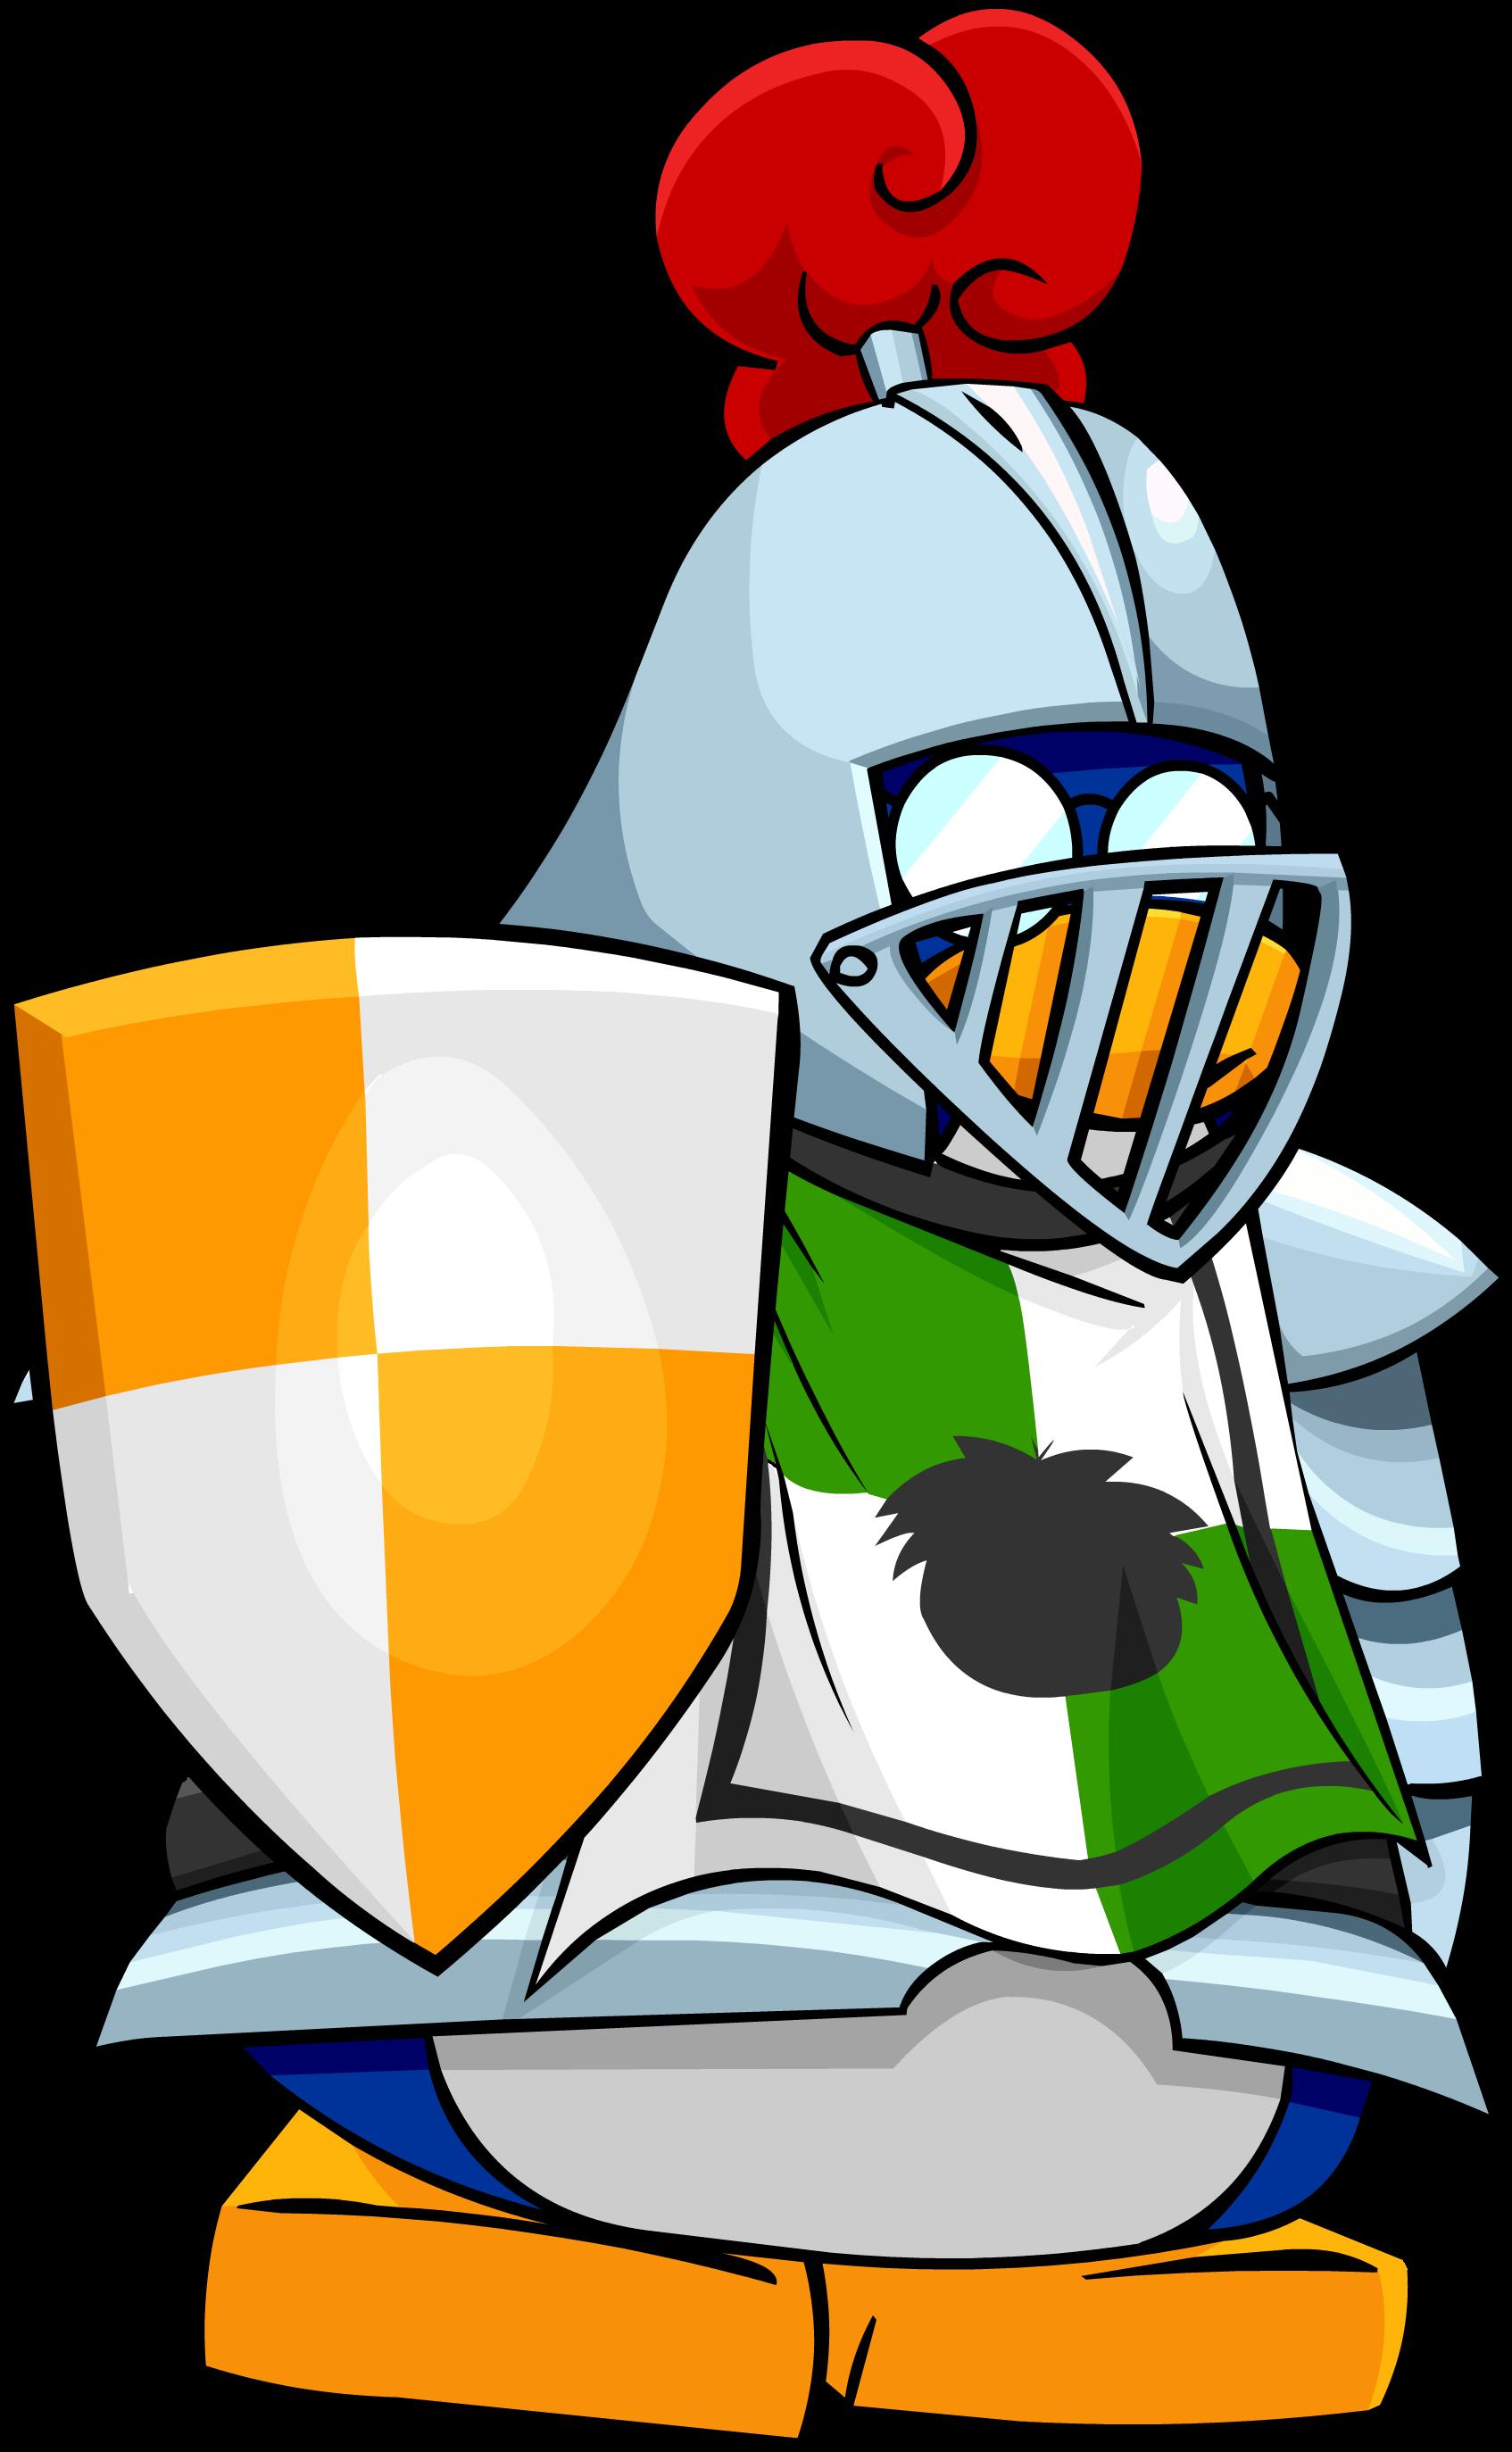 File:Gary knight.PNG